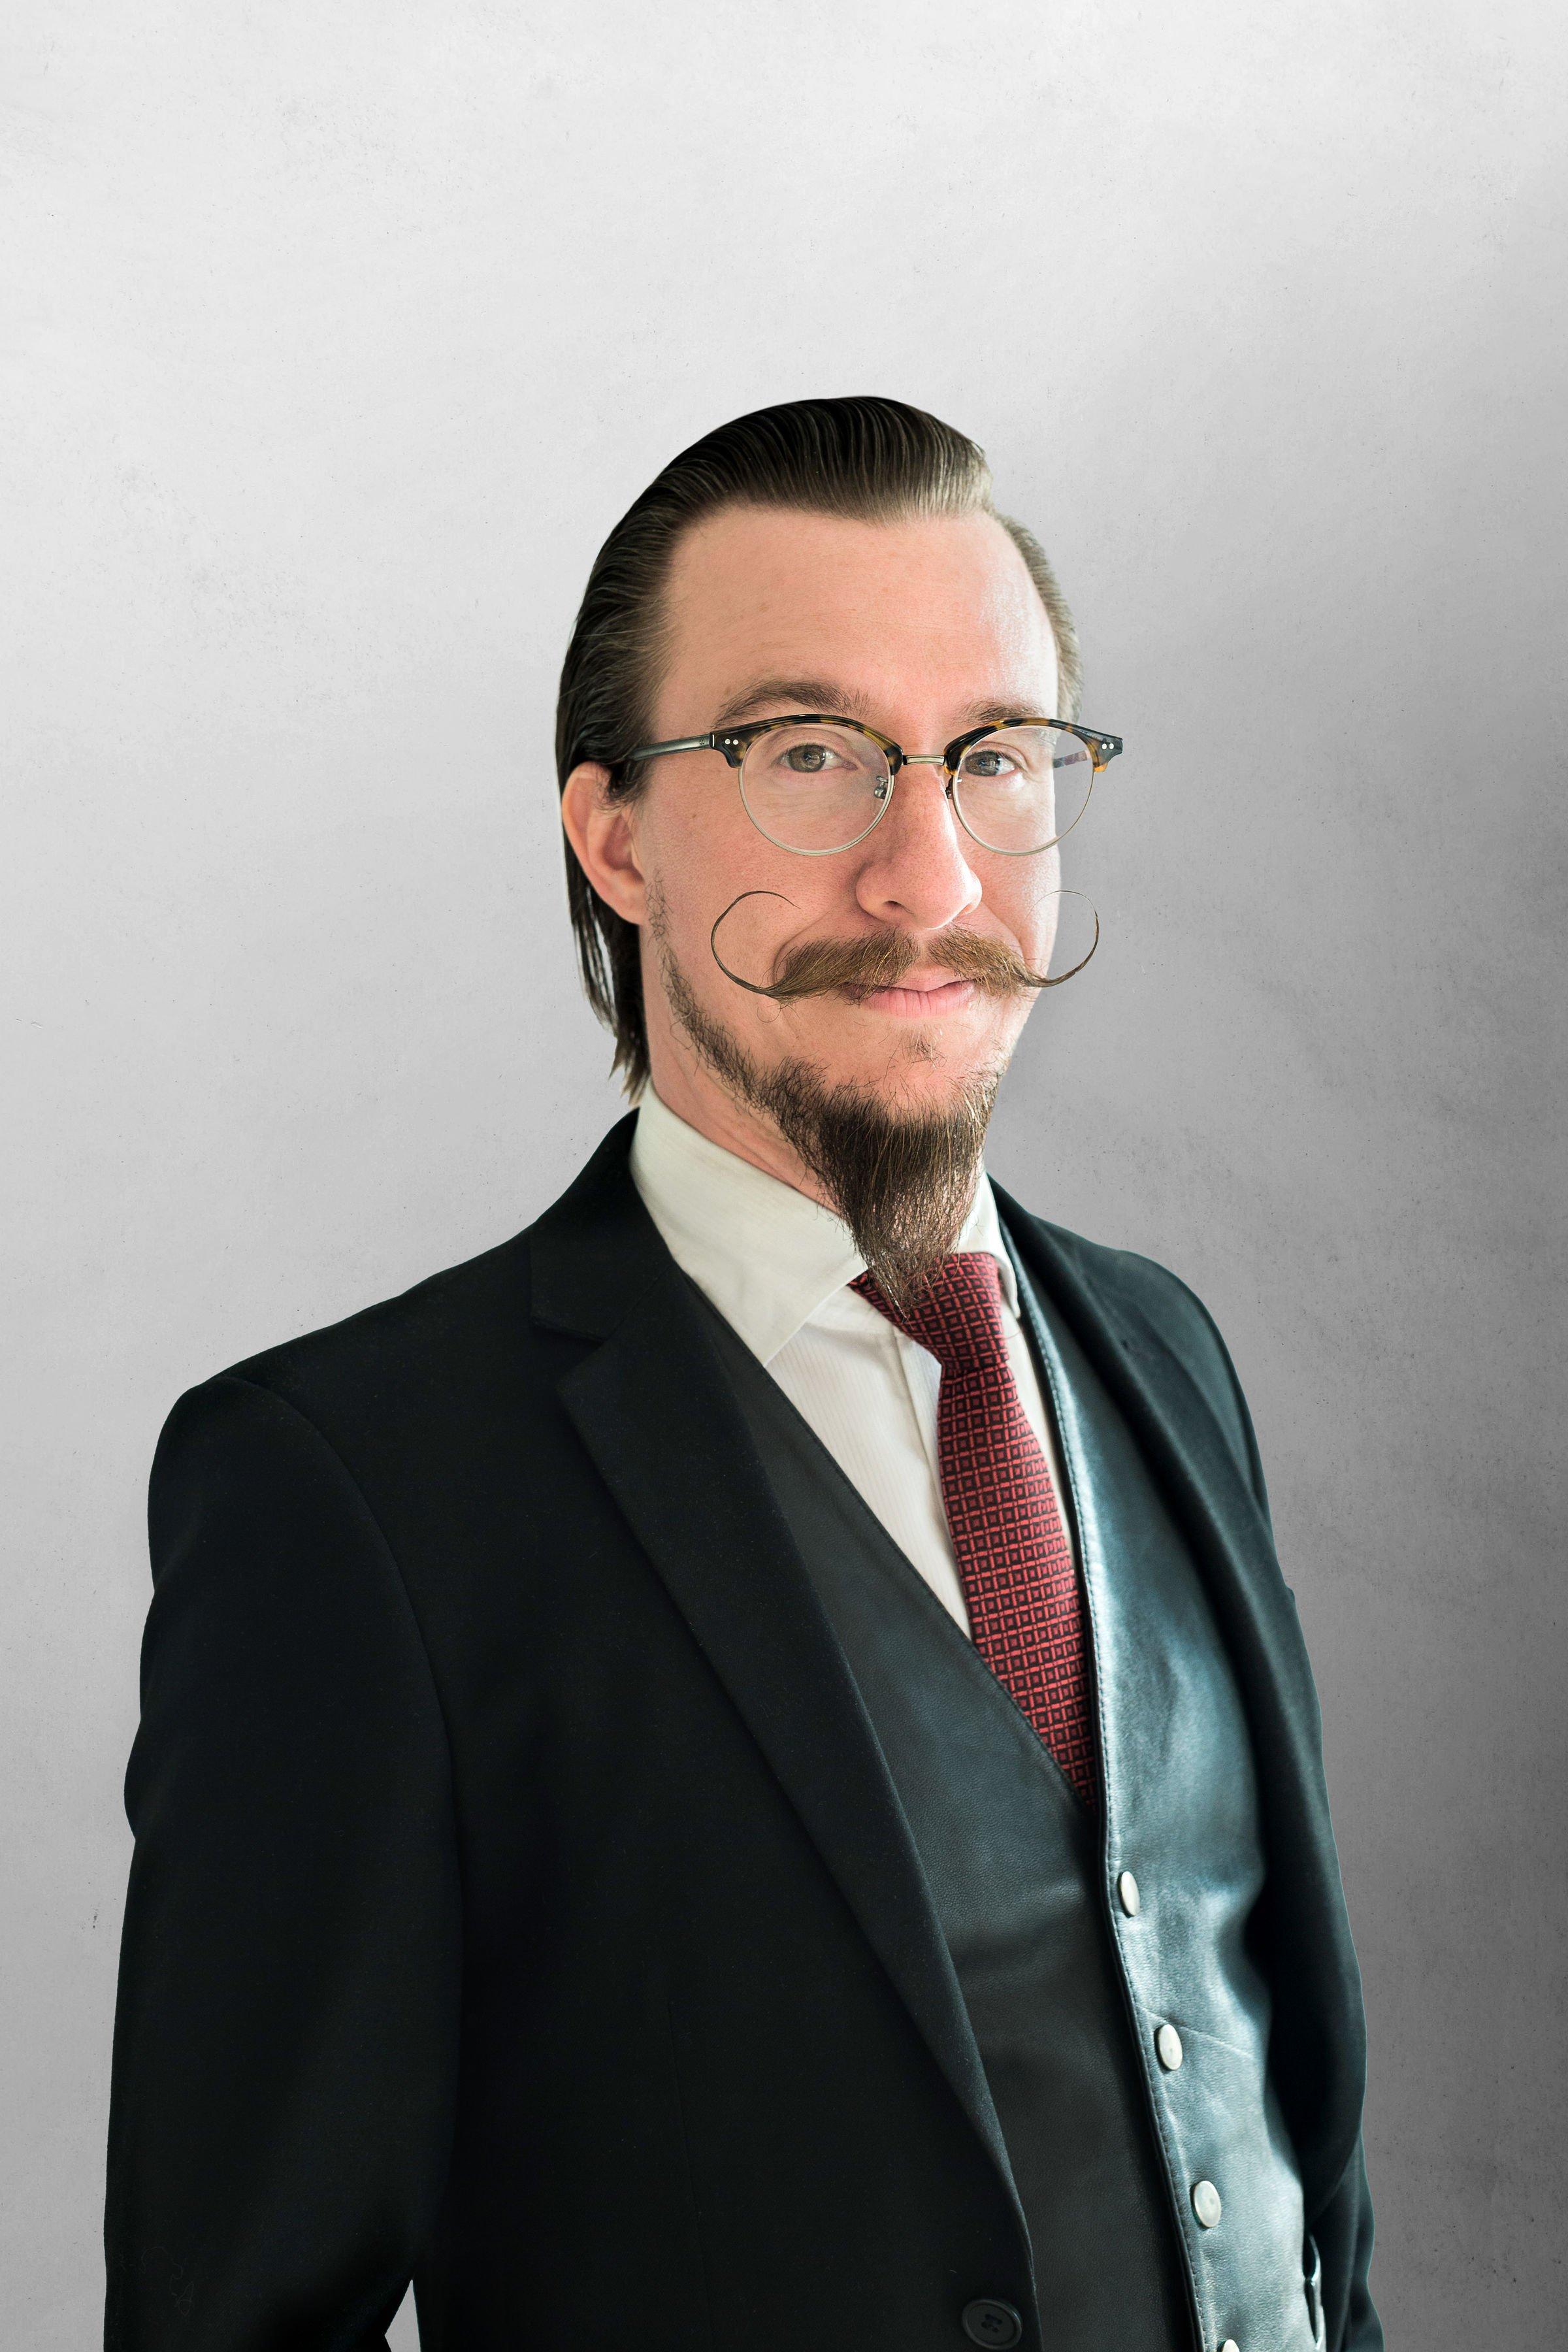 Erik B. Stenberg